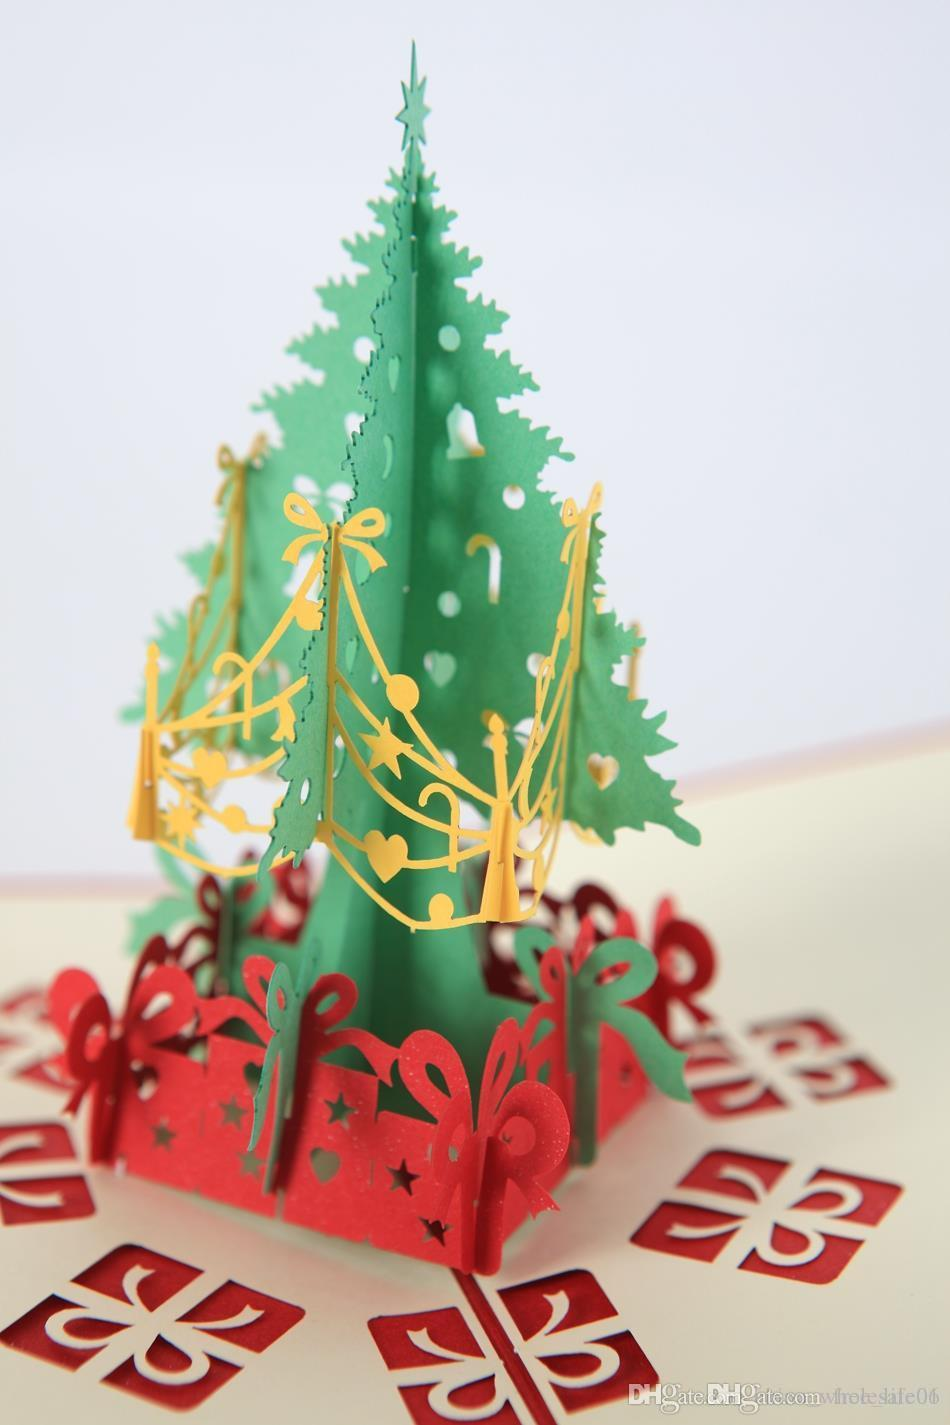 Merry Christmas Tree Vintage 3d Laser Cut Pop Up Paper Handmade